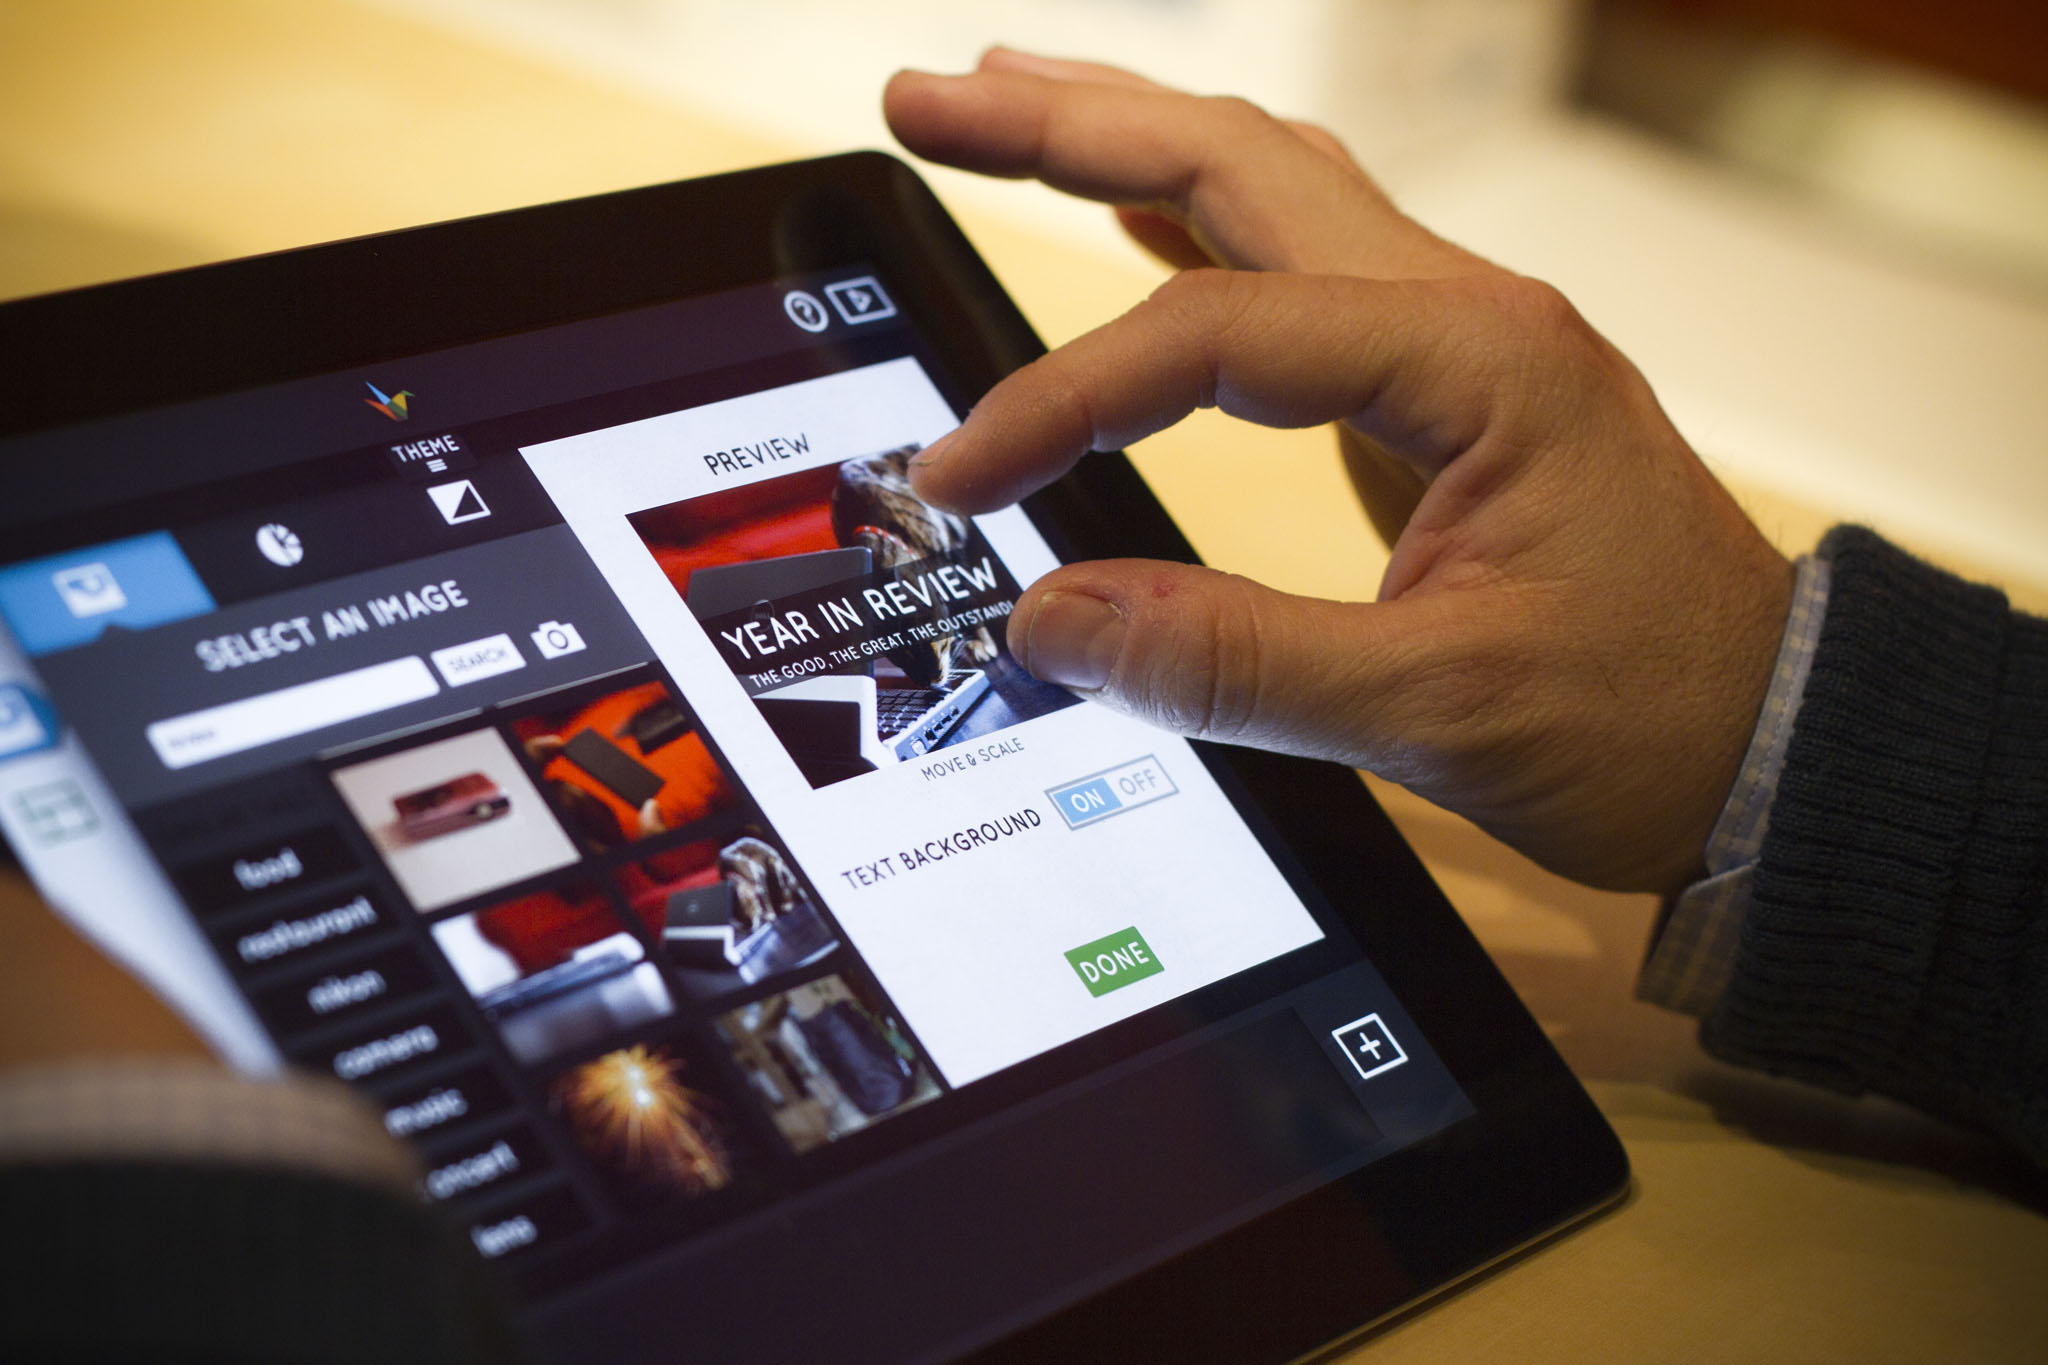 iPad Presentation App Haiku Deck Raises $3m Series A